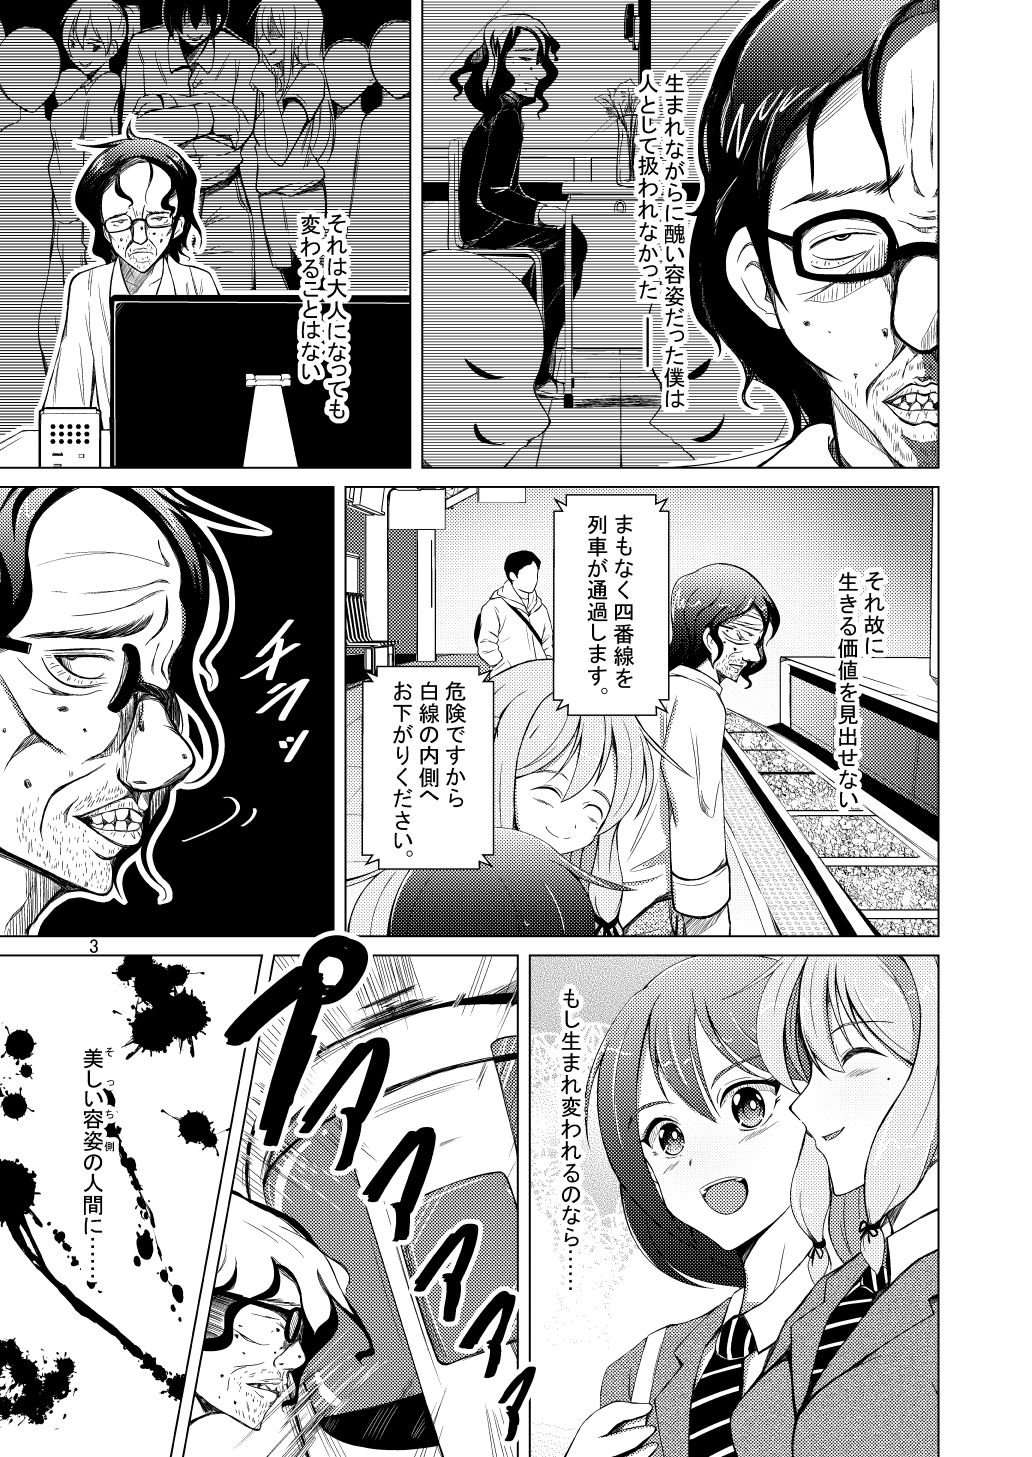 DESIRE 人生最期の逆転劇画像no.1